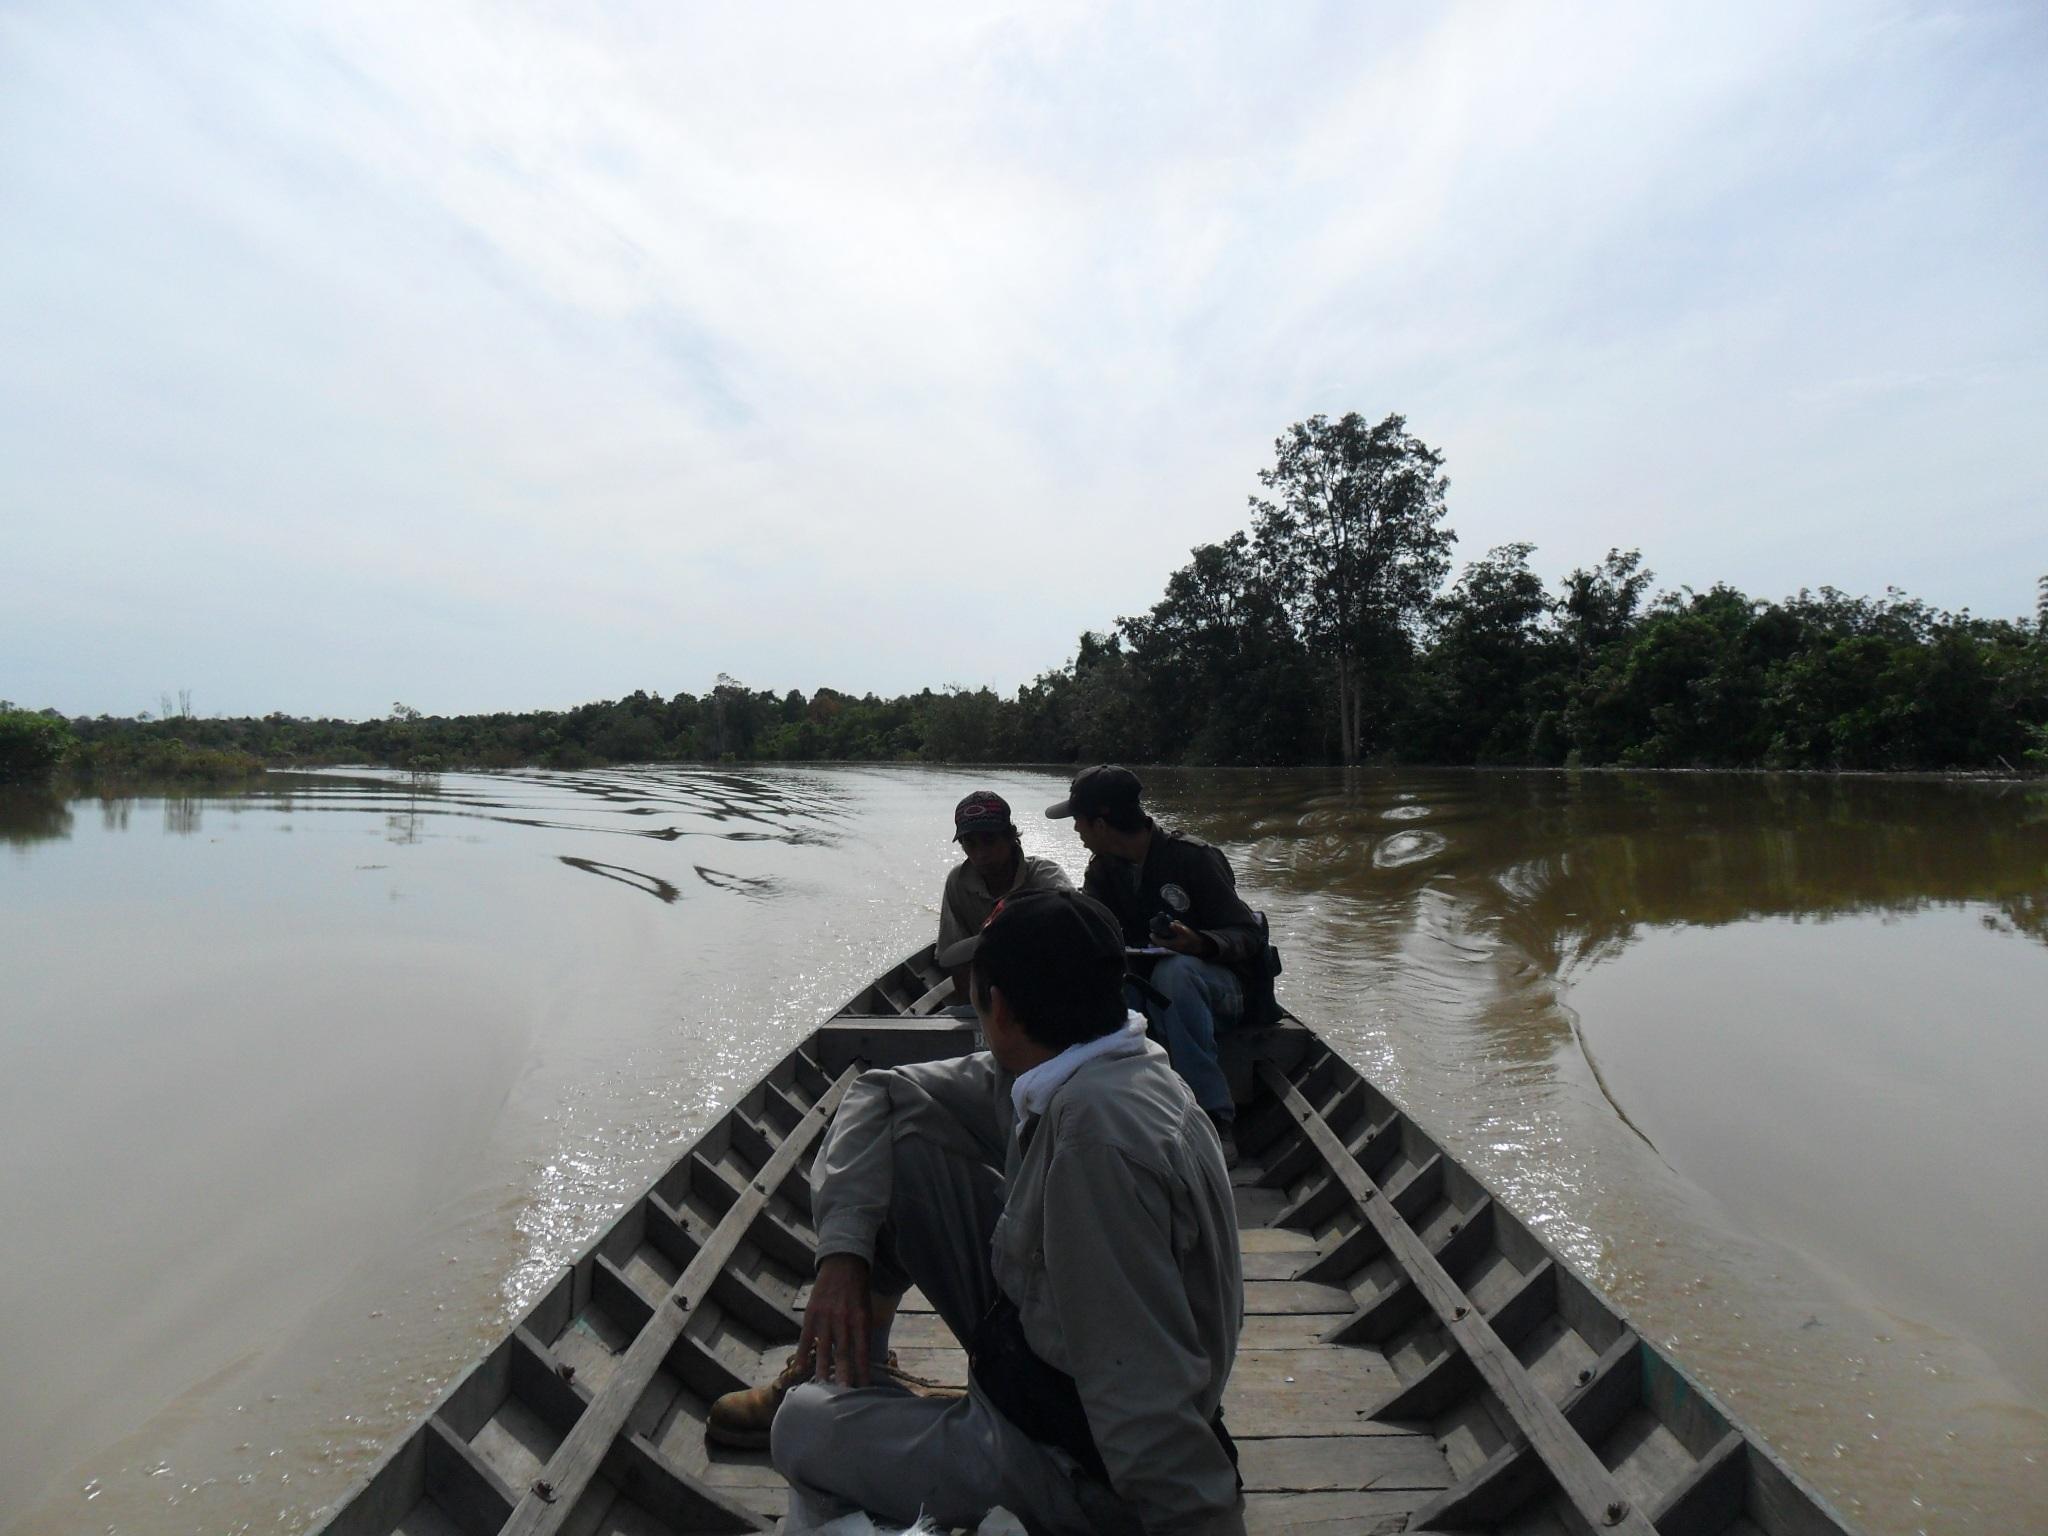 On boat, Boat, Floating, River, Sailor, HQ Photo